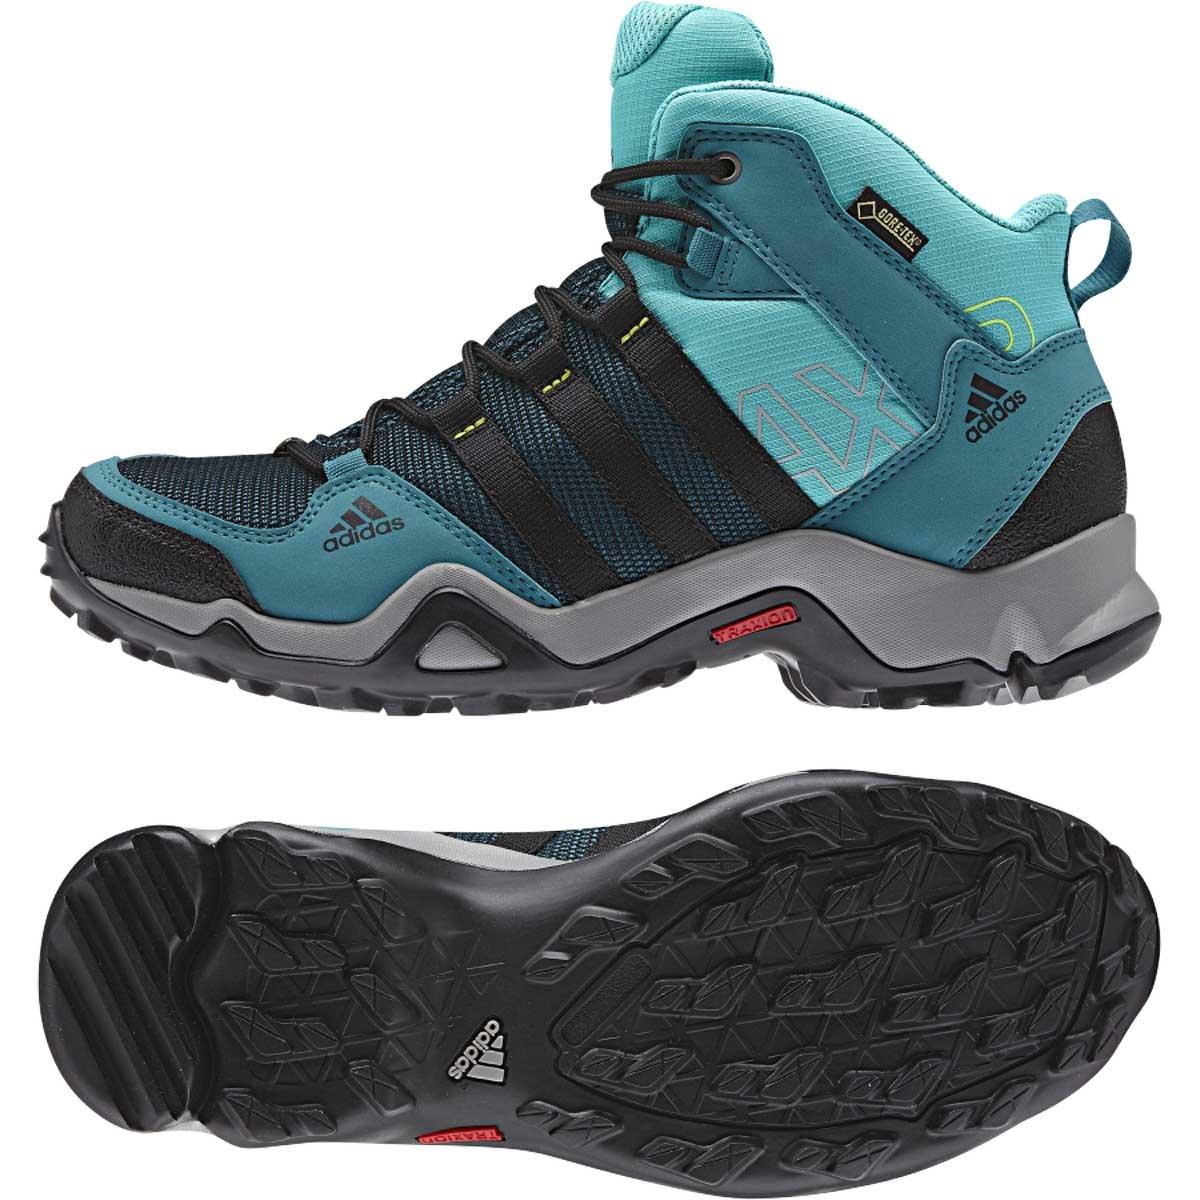 adidas Womens AX 2 Mid GTX Hiking Shoes, 7 UK, Power Teal